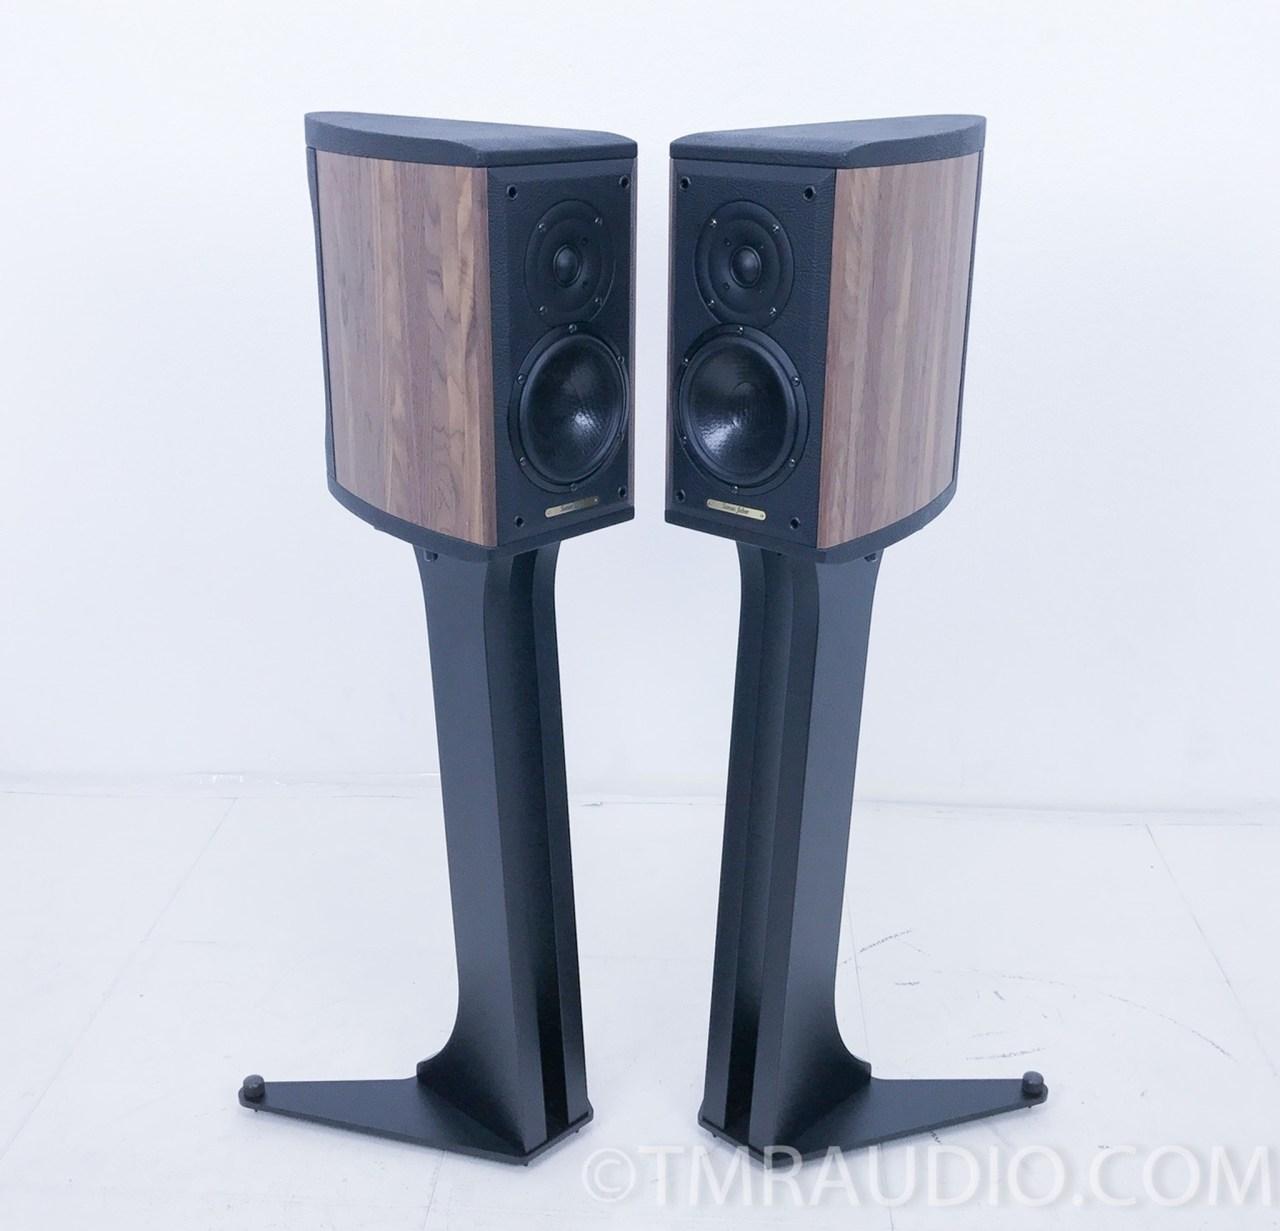 sonus faber liuto monitors / speakers w/stands; walnut pair - the